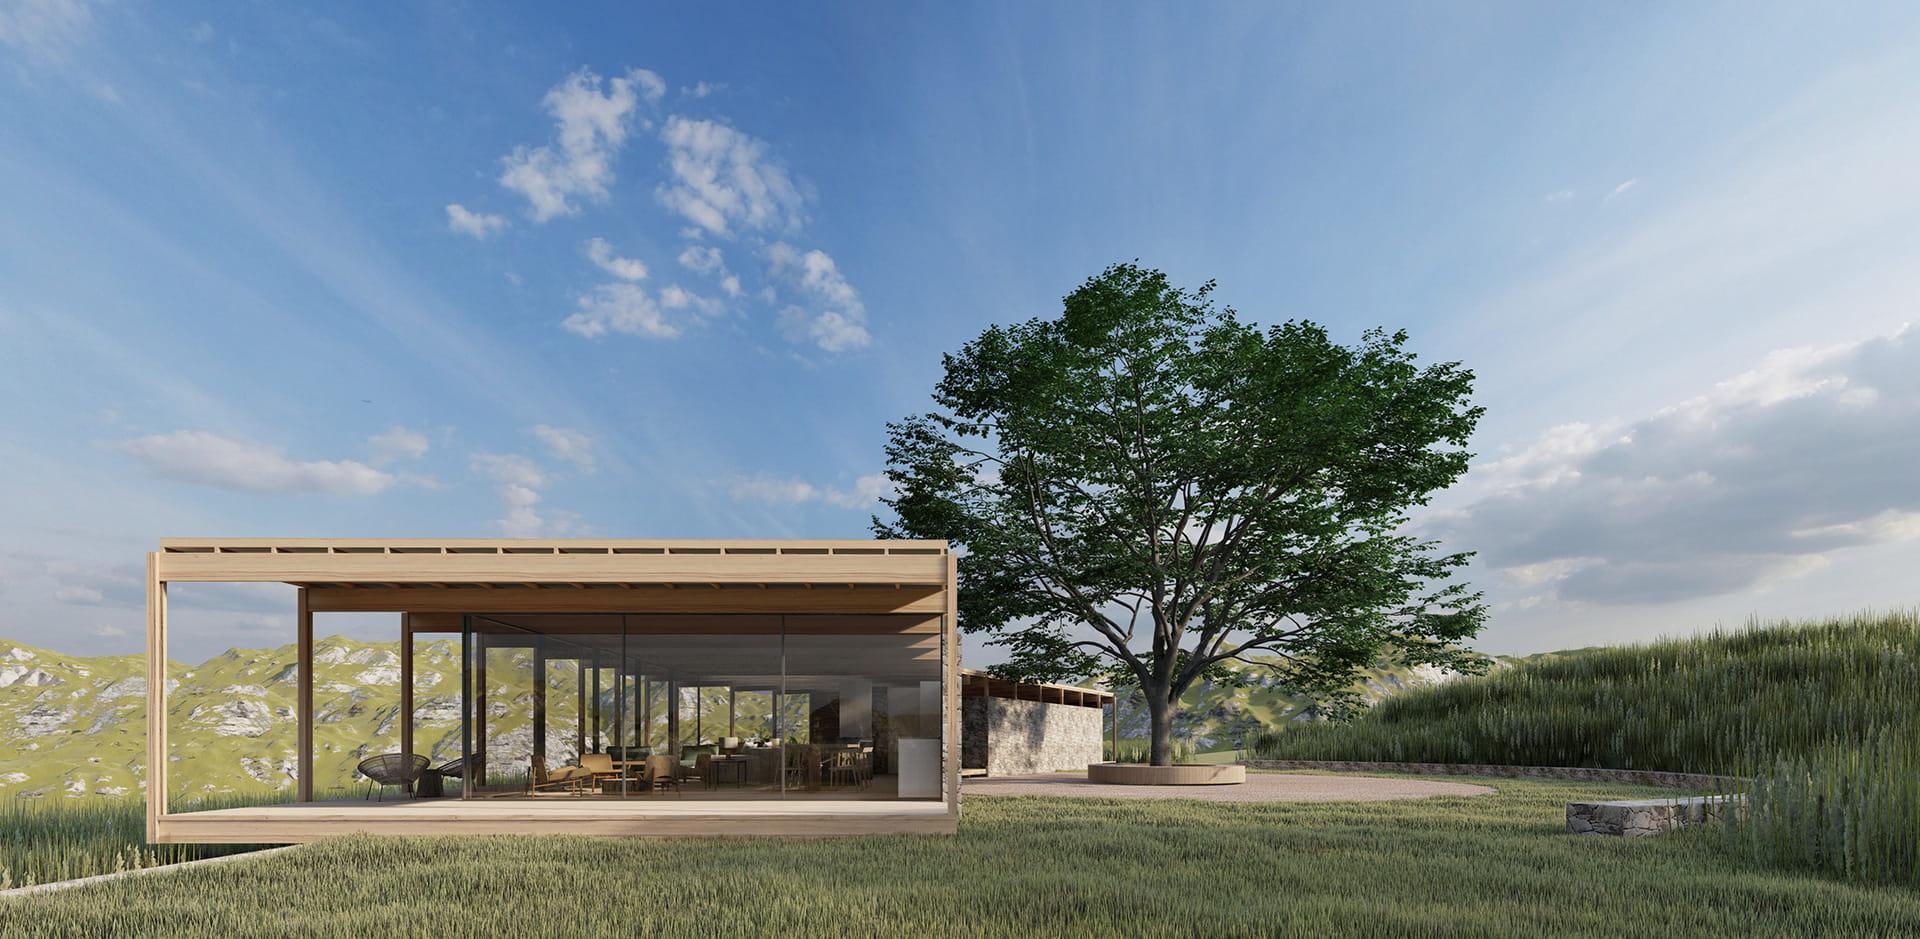 Casa Minas Gerais Itanhandu - Sabella Arquitetura